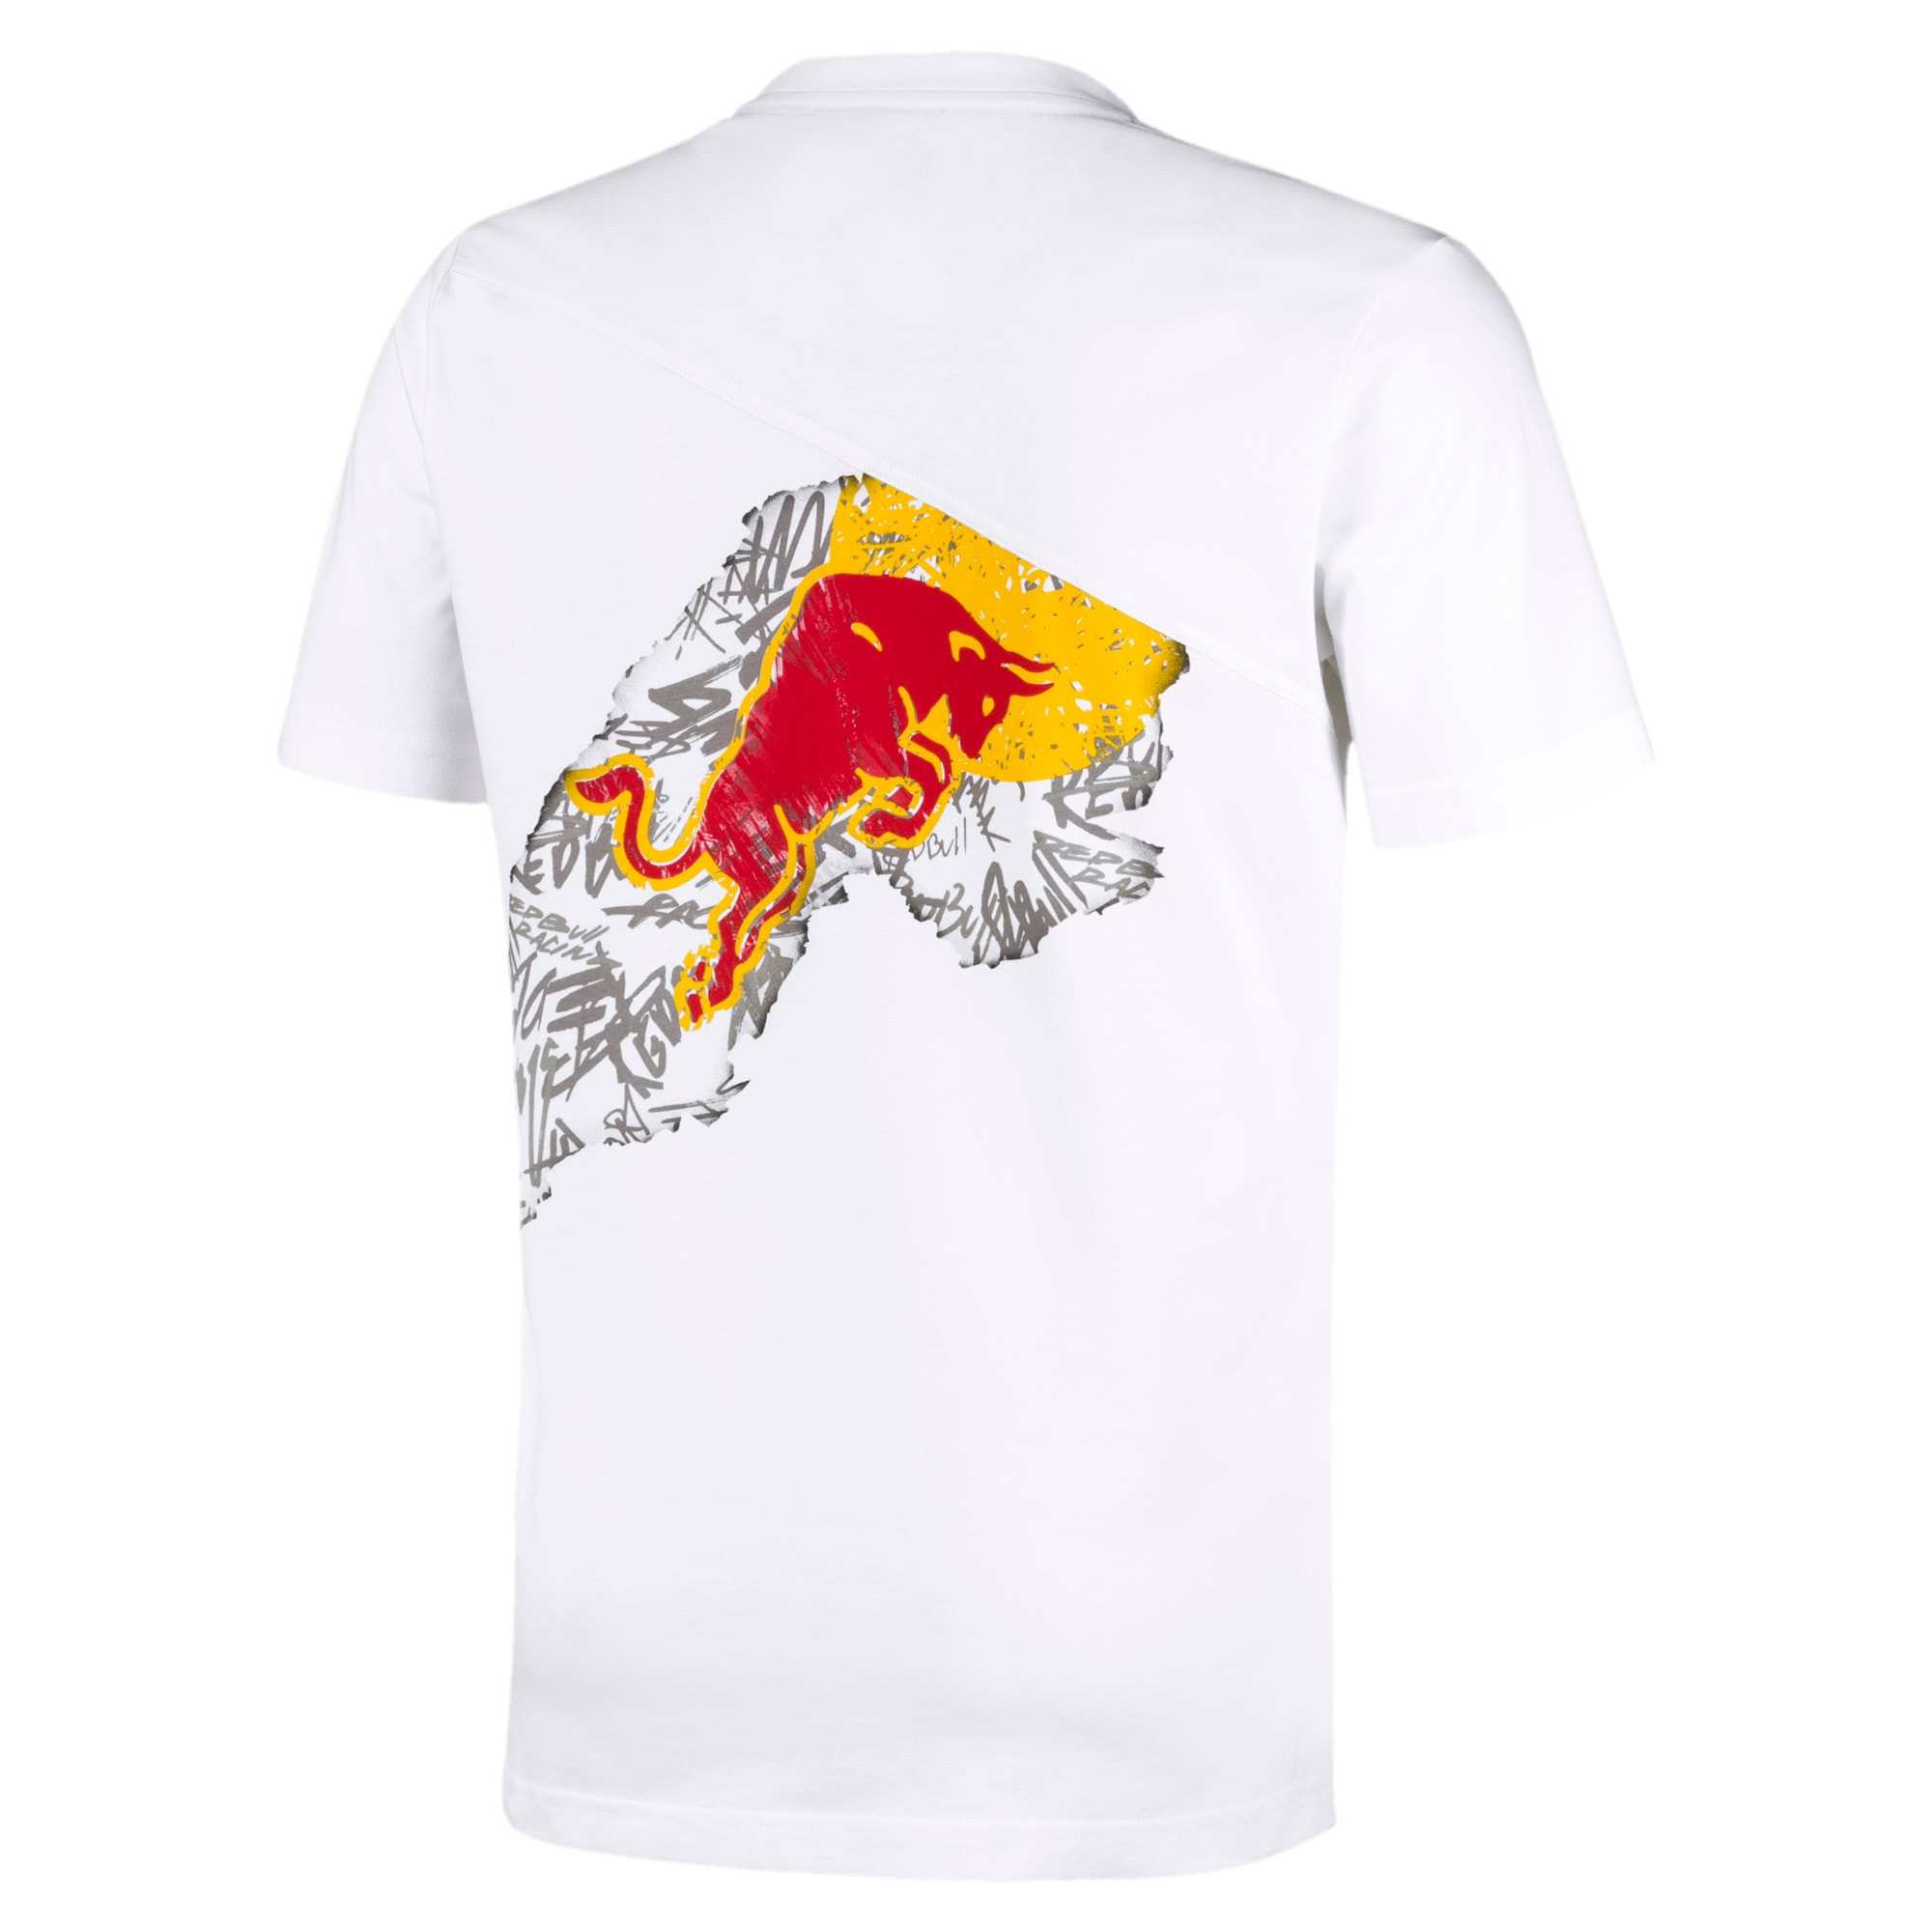 Thumbnail 5 of Red Bull Racing Dynamic Bull Herren T-Shirt, Puma White, medium